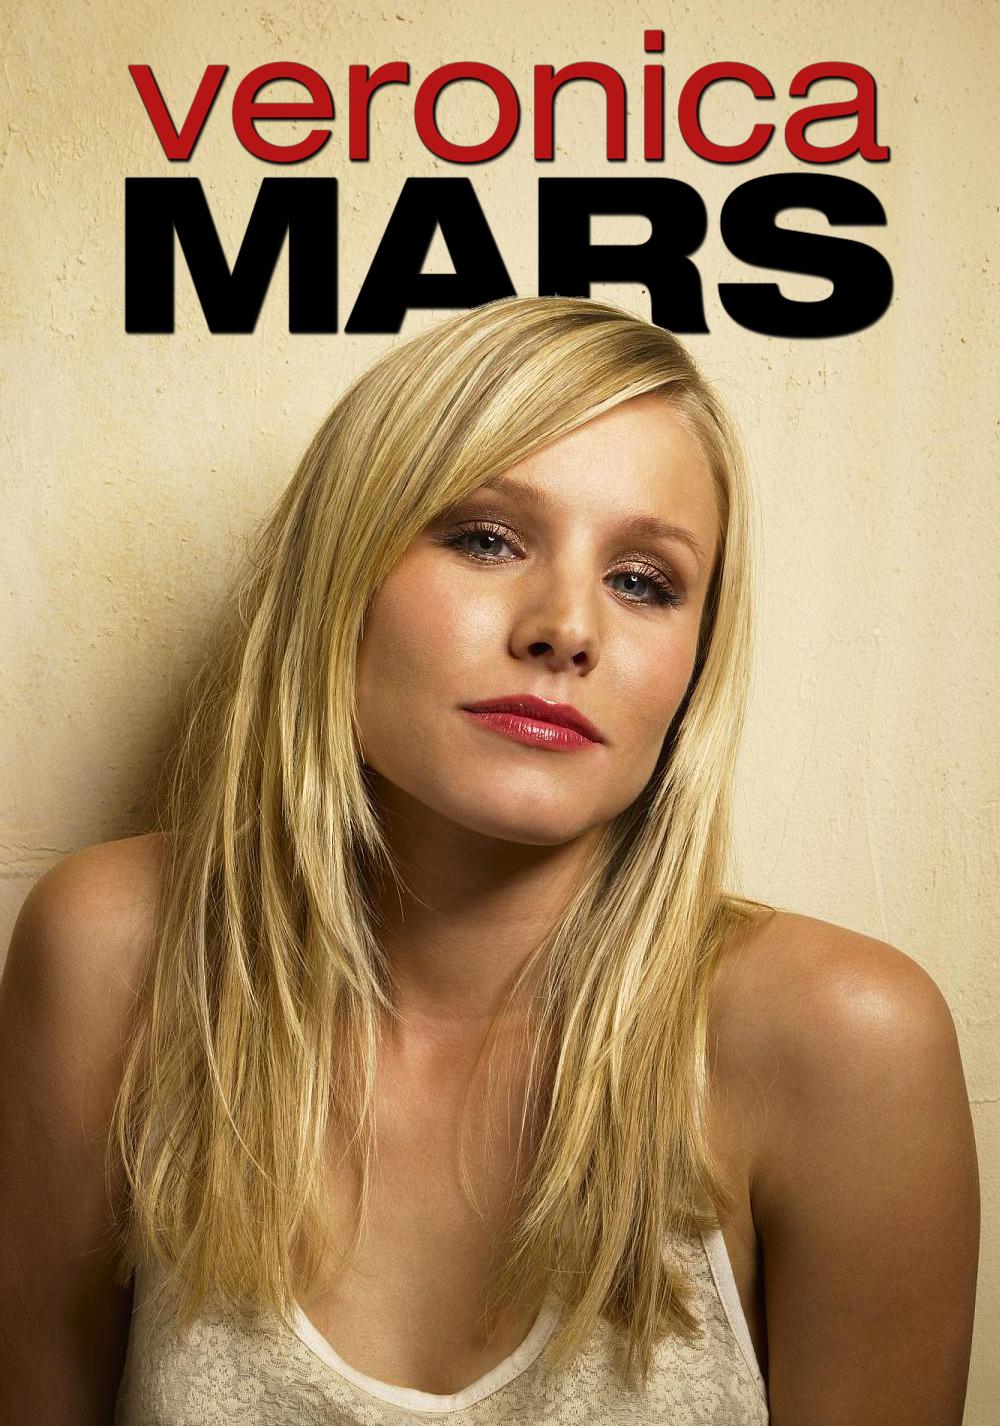 Veronica Mars | TV fan... Veronica Mars Season 2